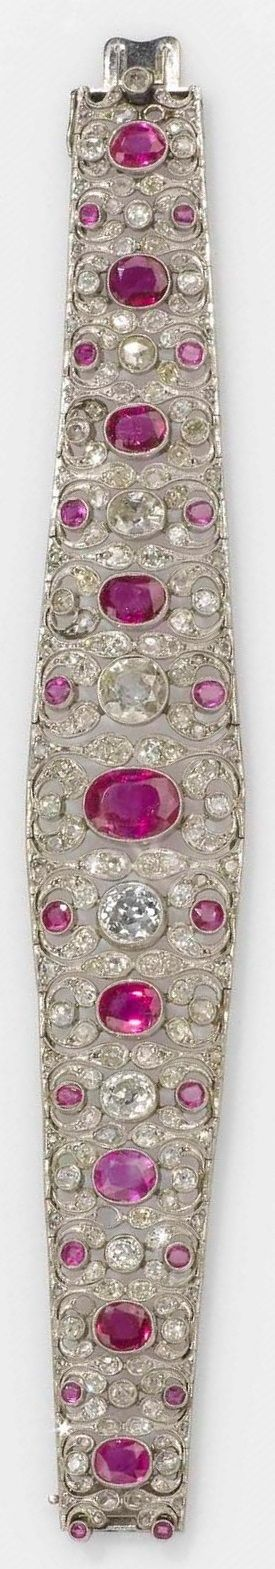 An antique platinum, diamond and Burmese ruby bracelet, USA, second half of the…